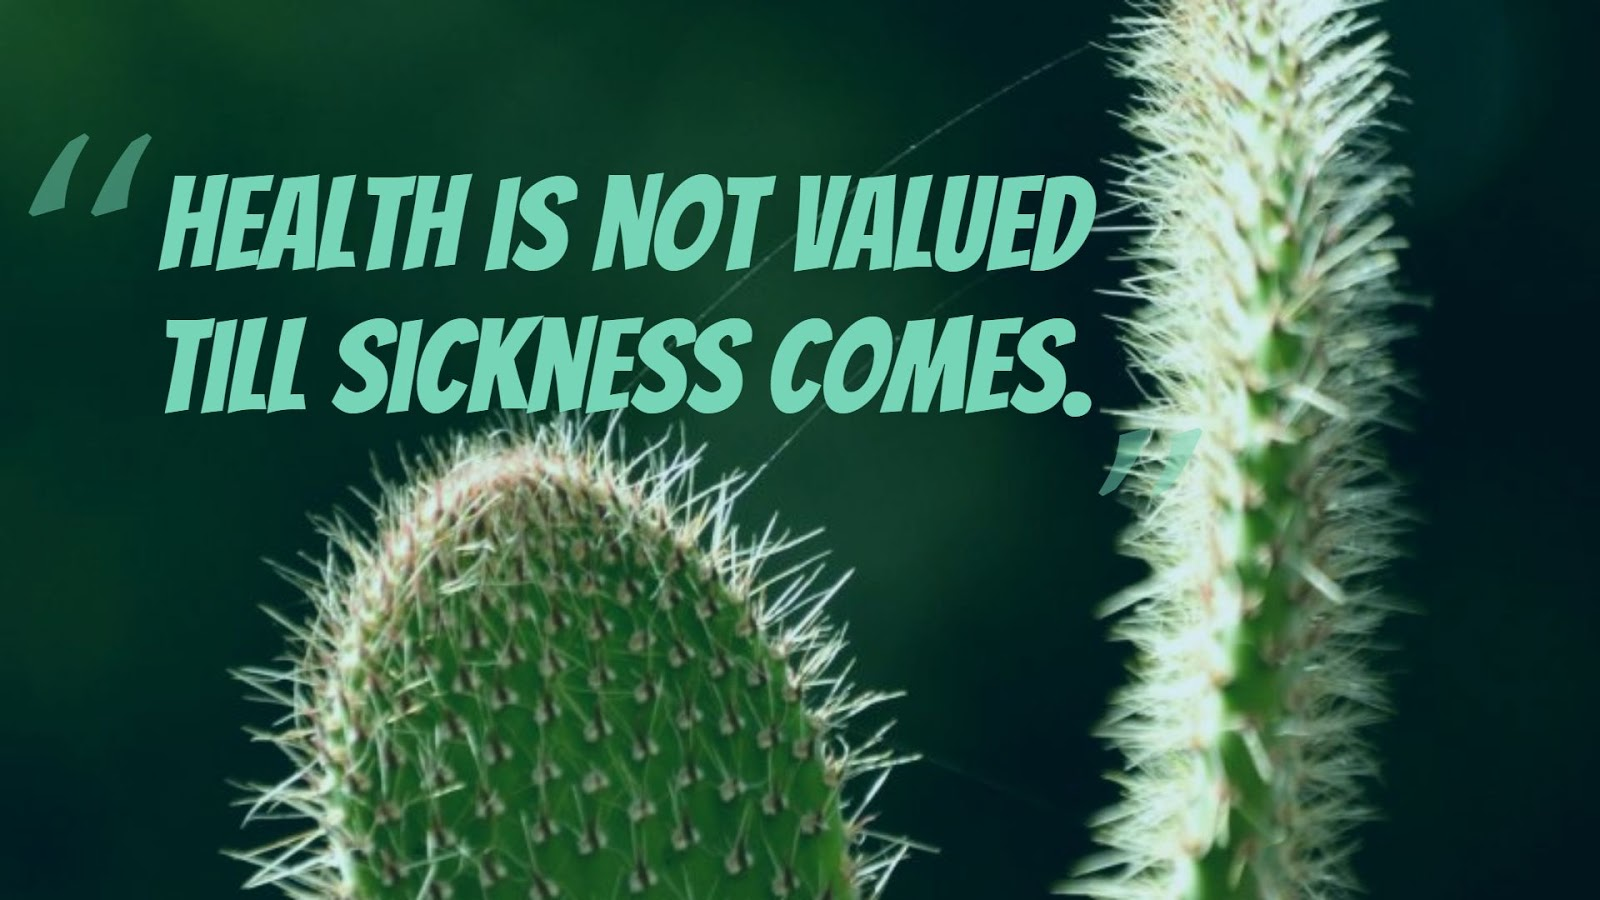 Hate Sickness